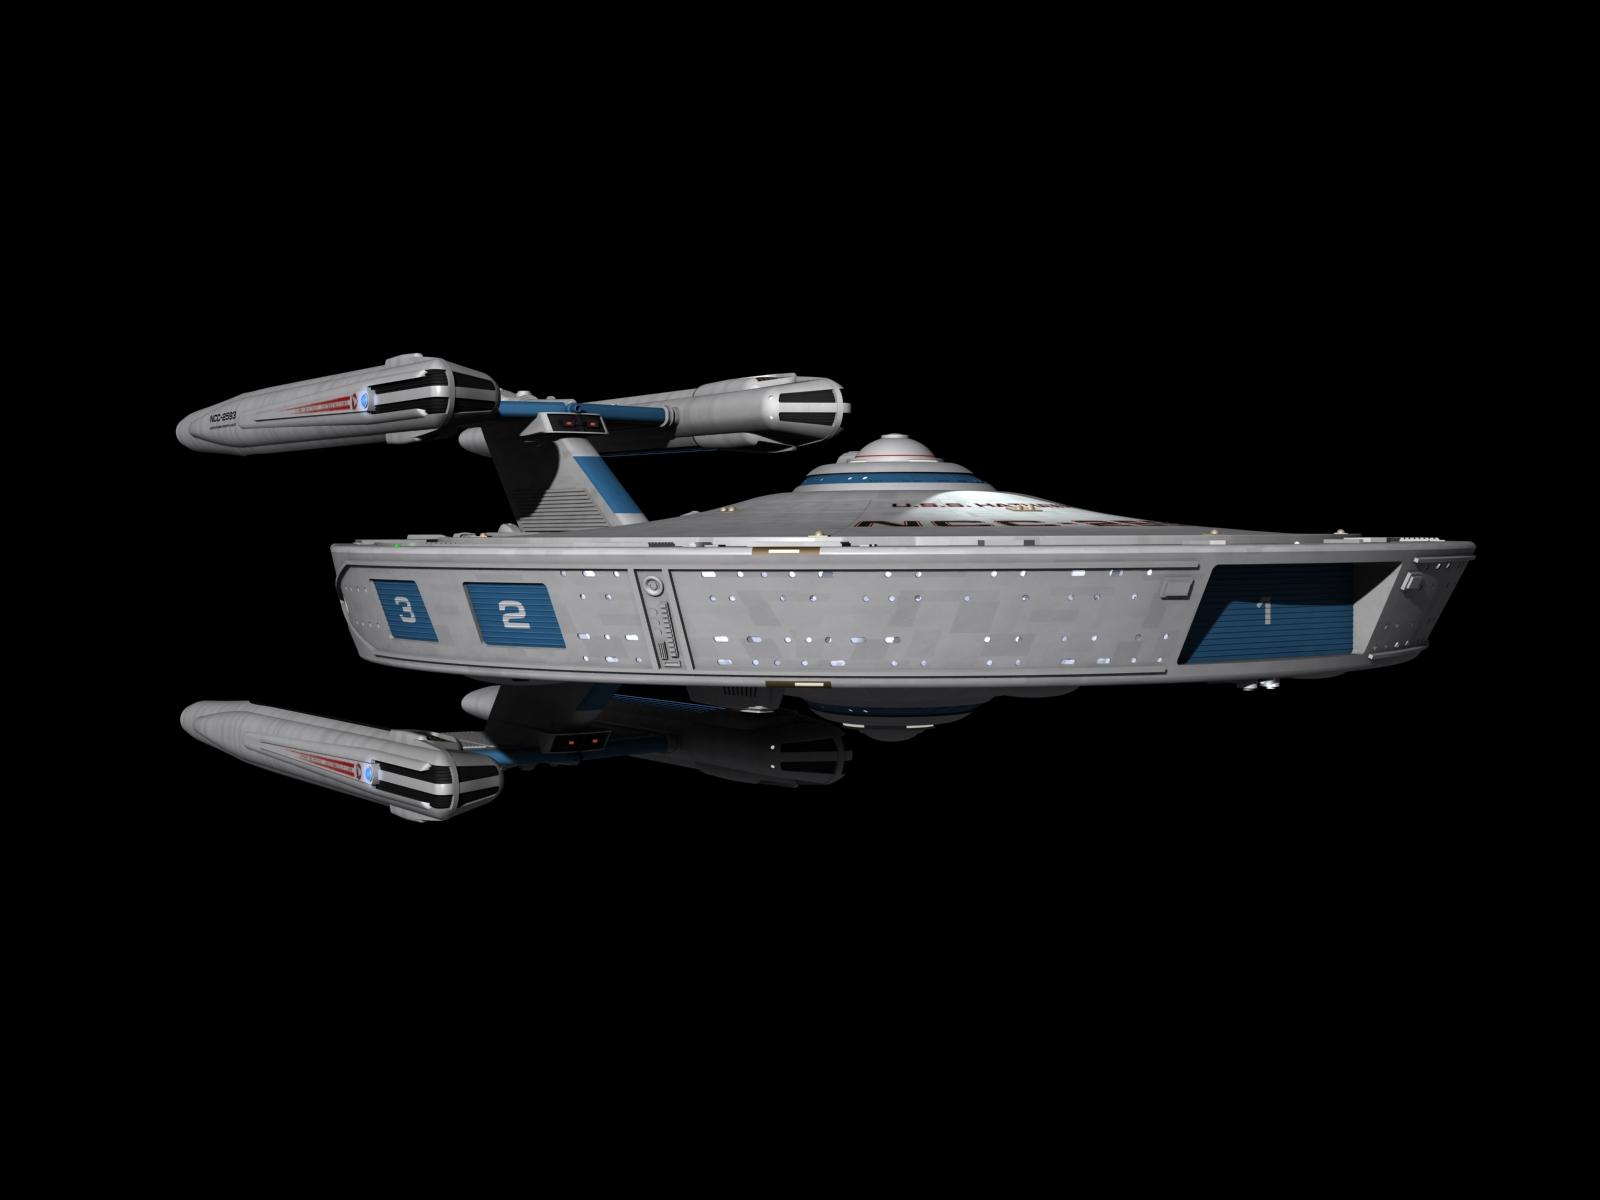 Constellation class by metlesitsfleetyards